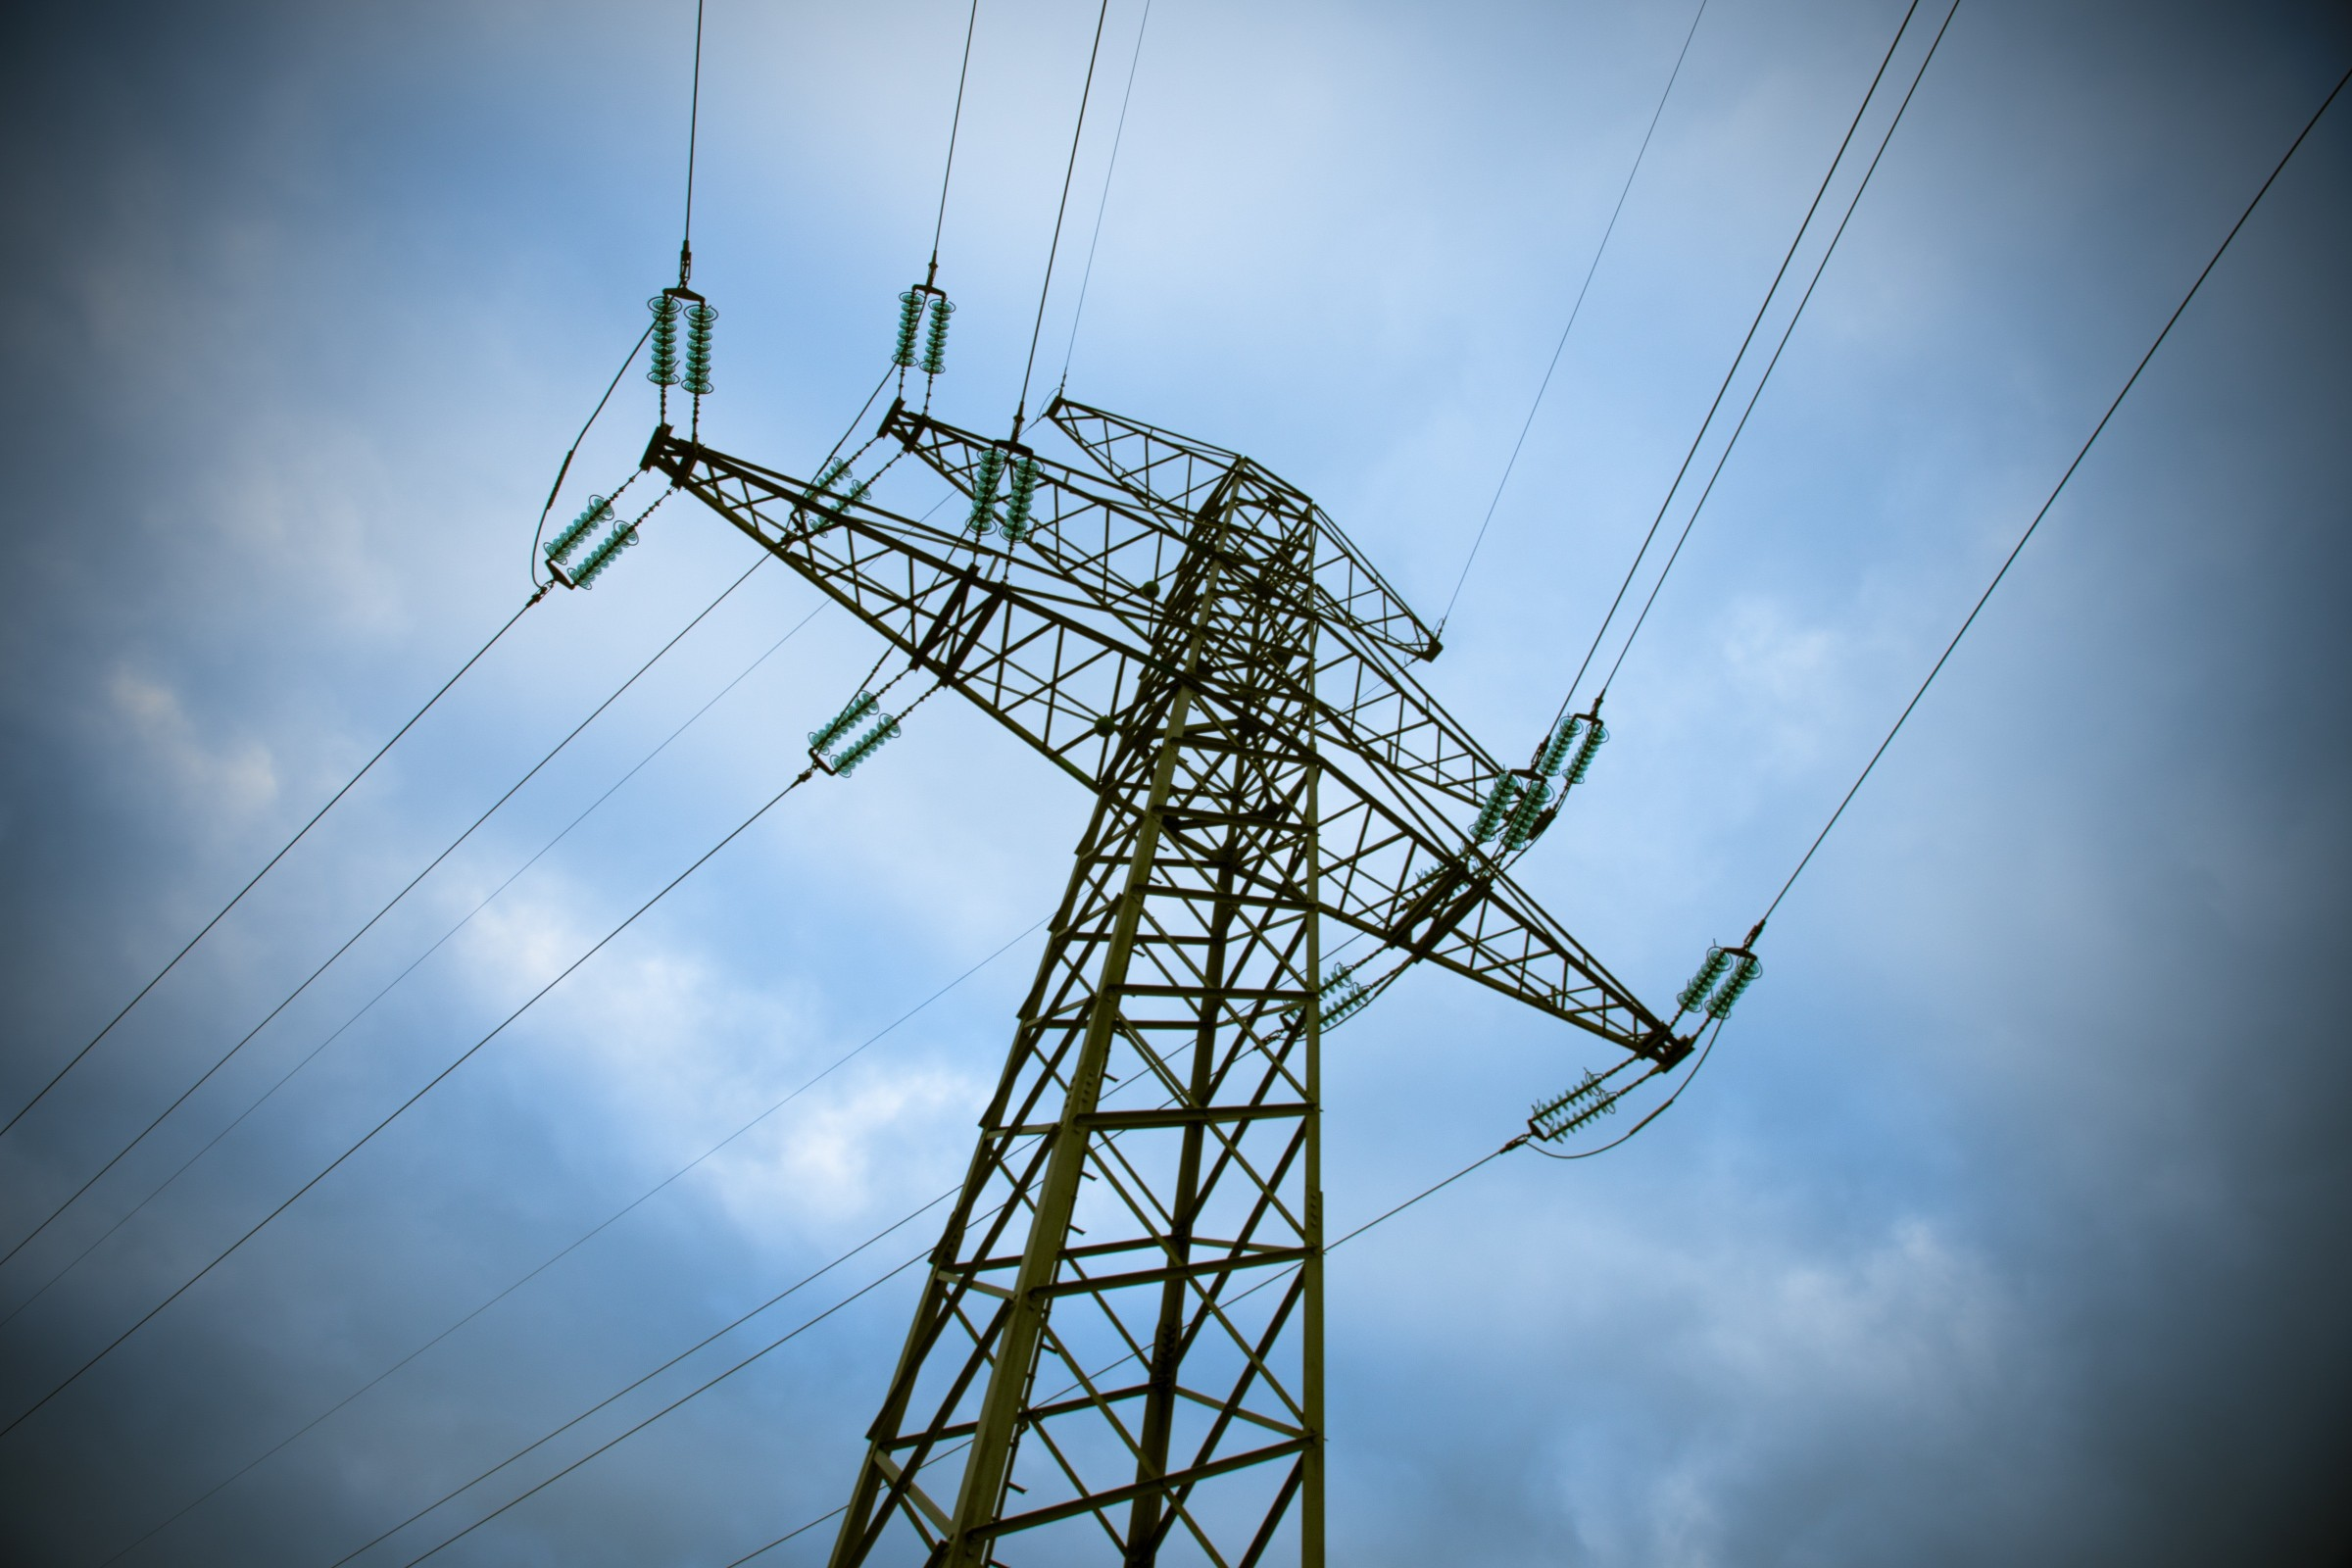 Dan Soschin - Public Utilities and PR